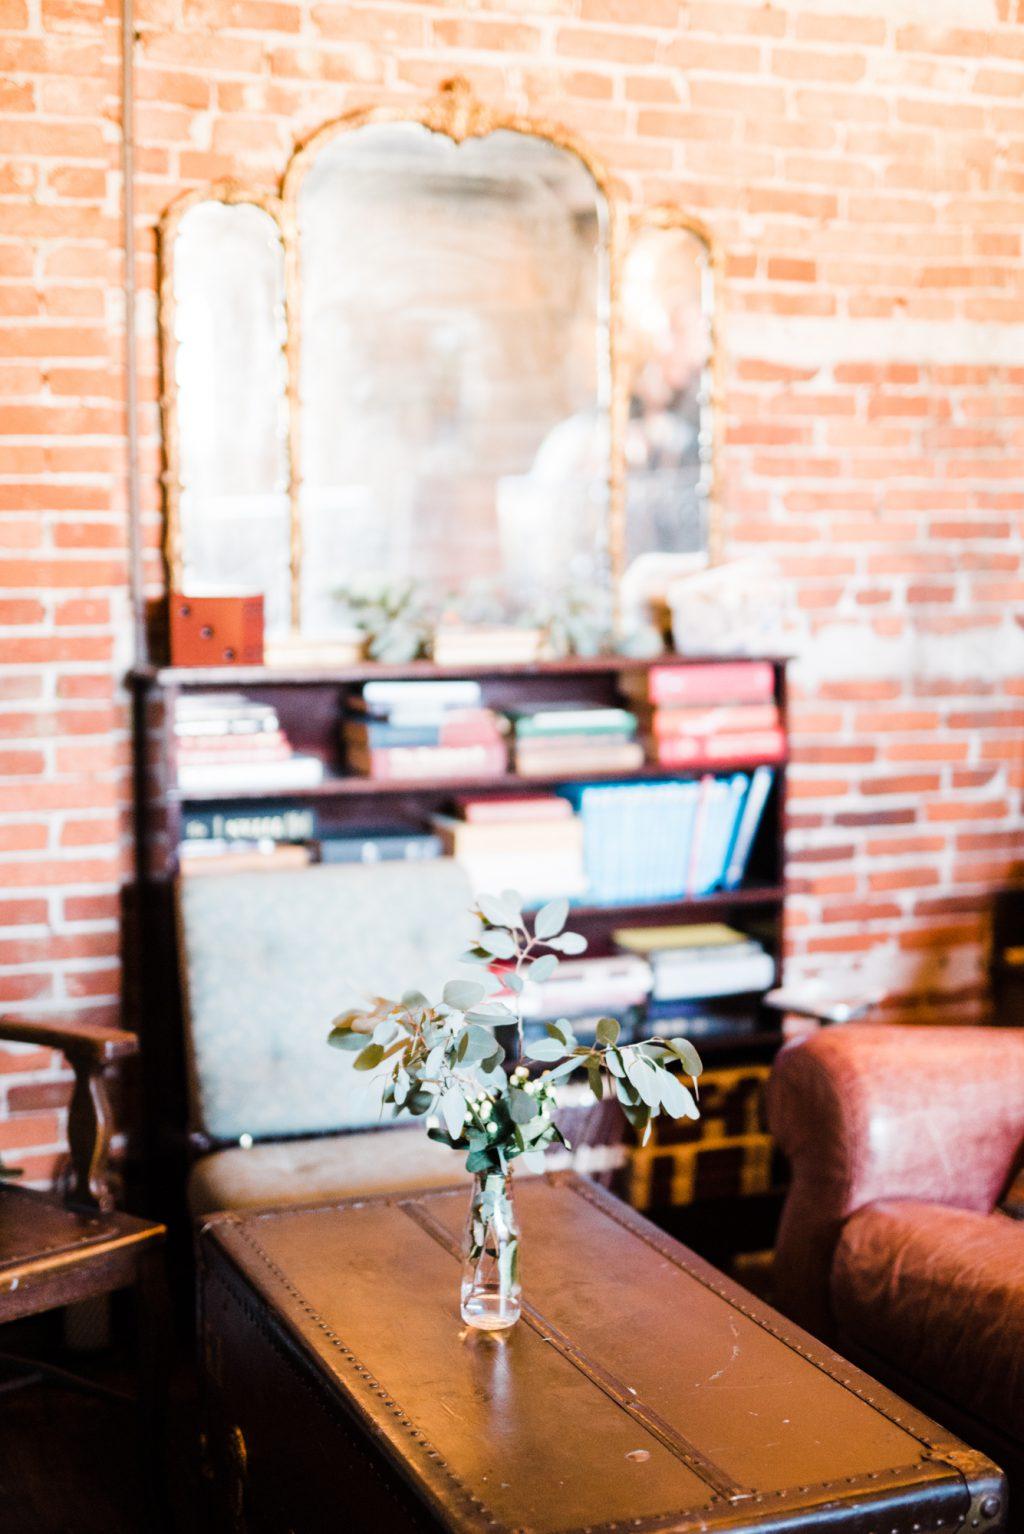 haley-richter-photo-west-chester-summer-wedding-boxcar-brewery-161